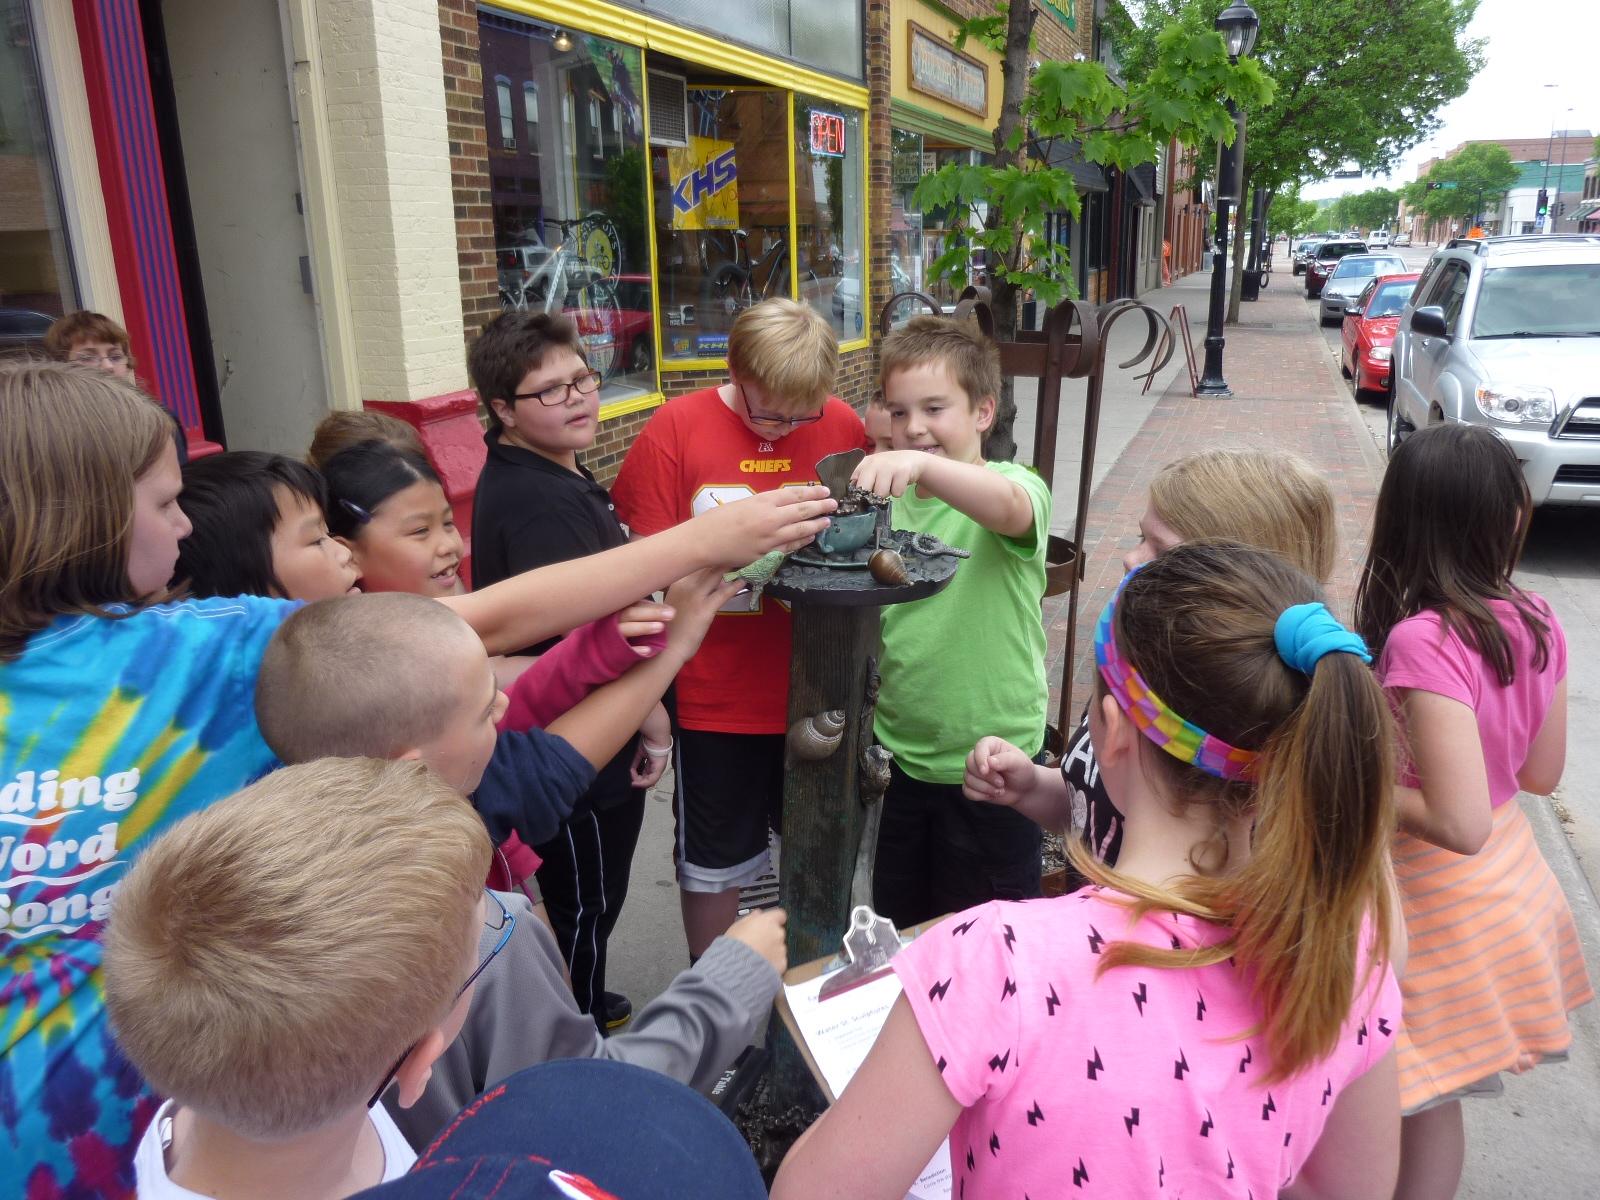 Children touching sculpture